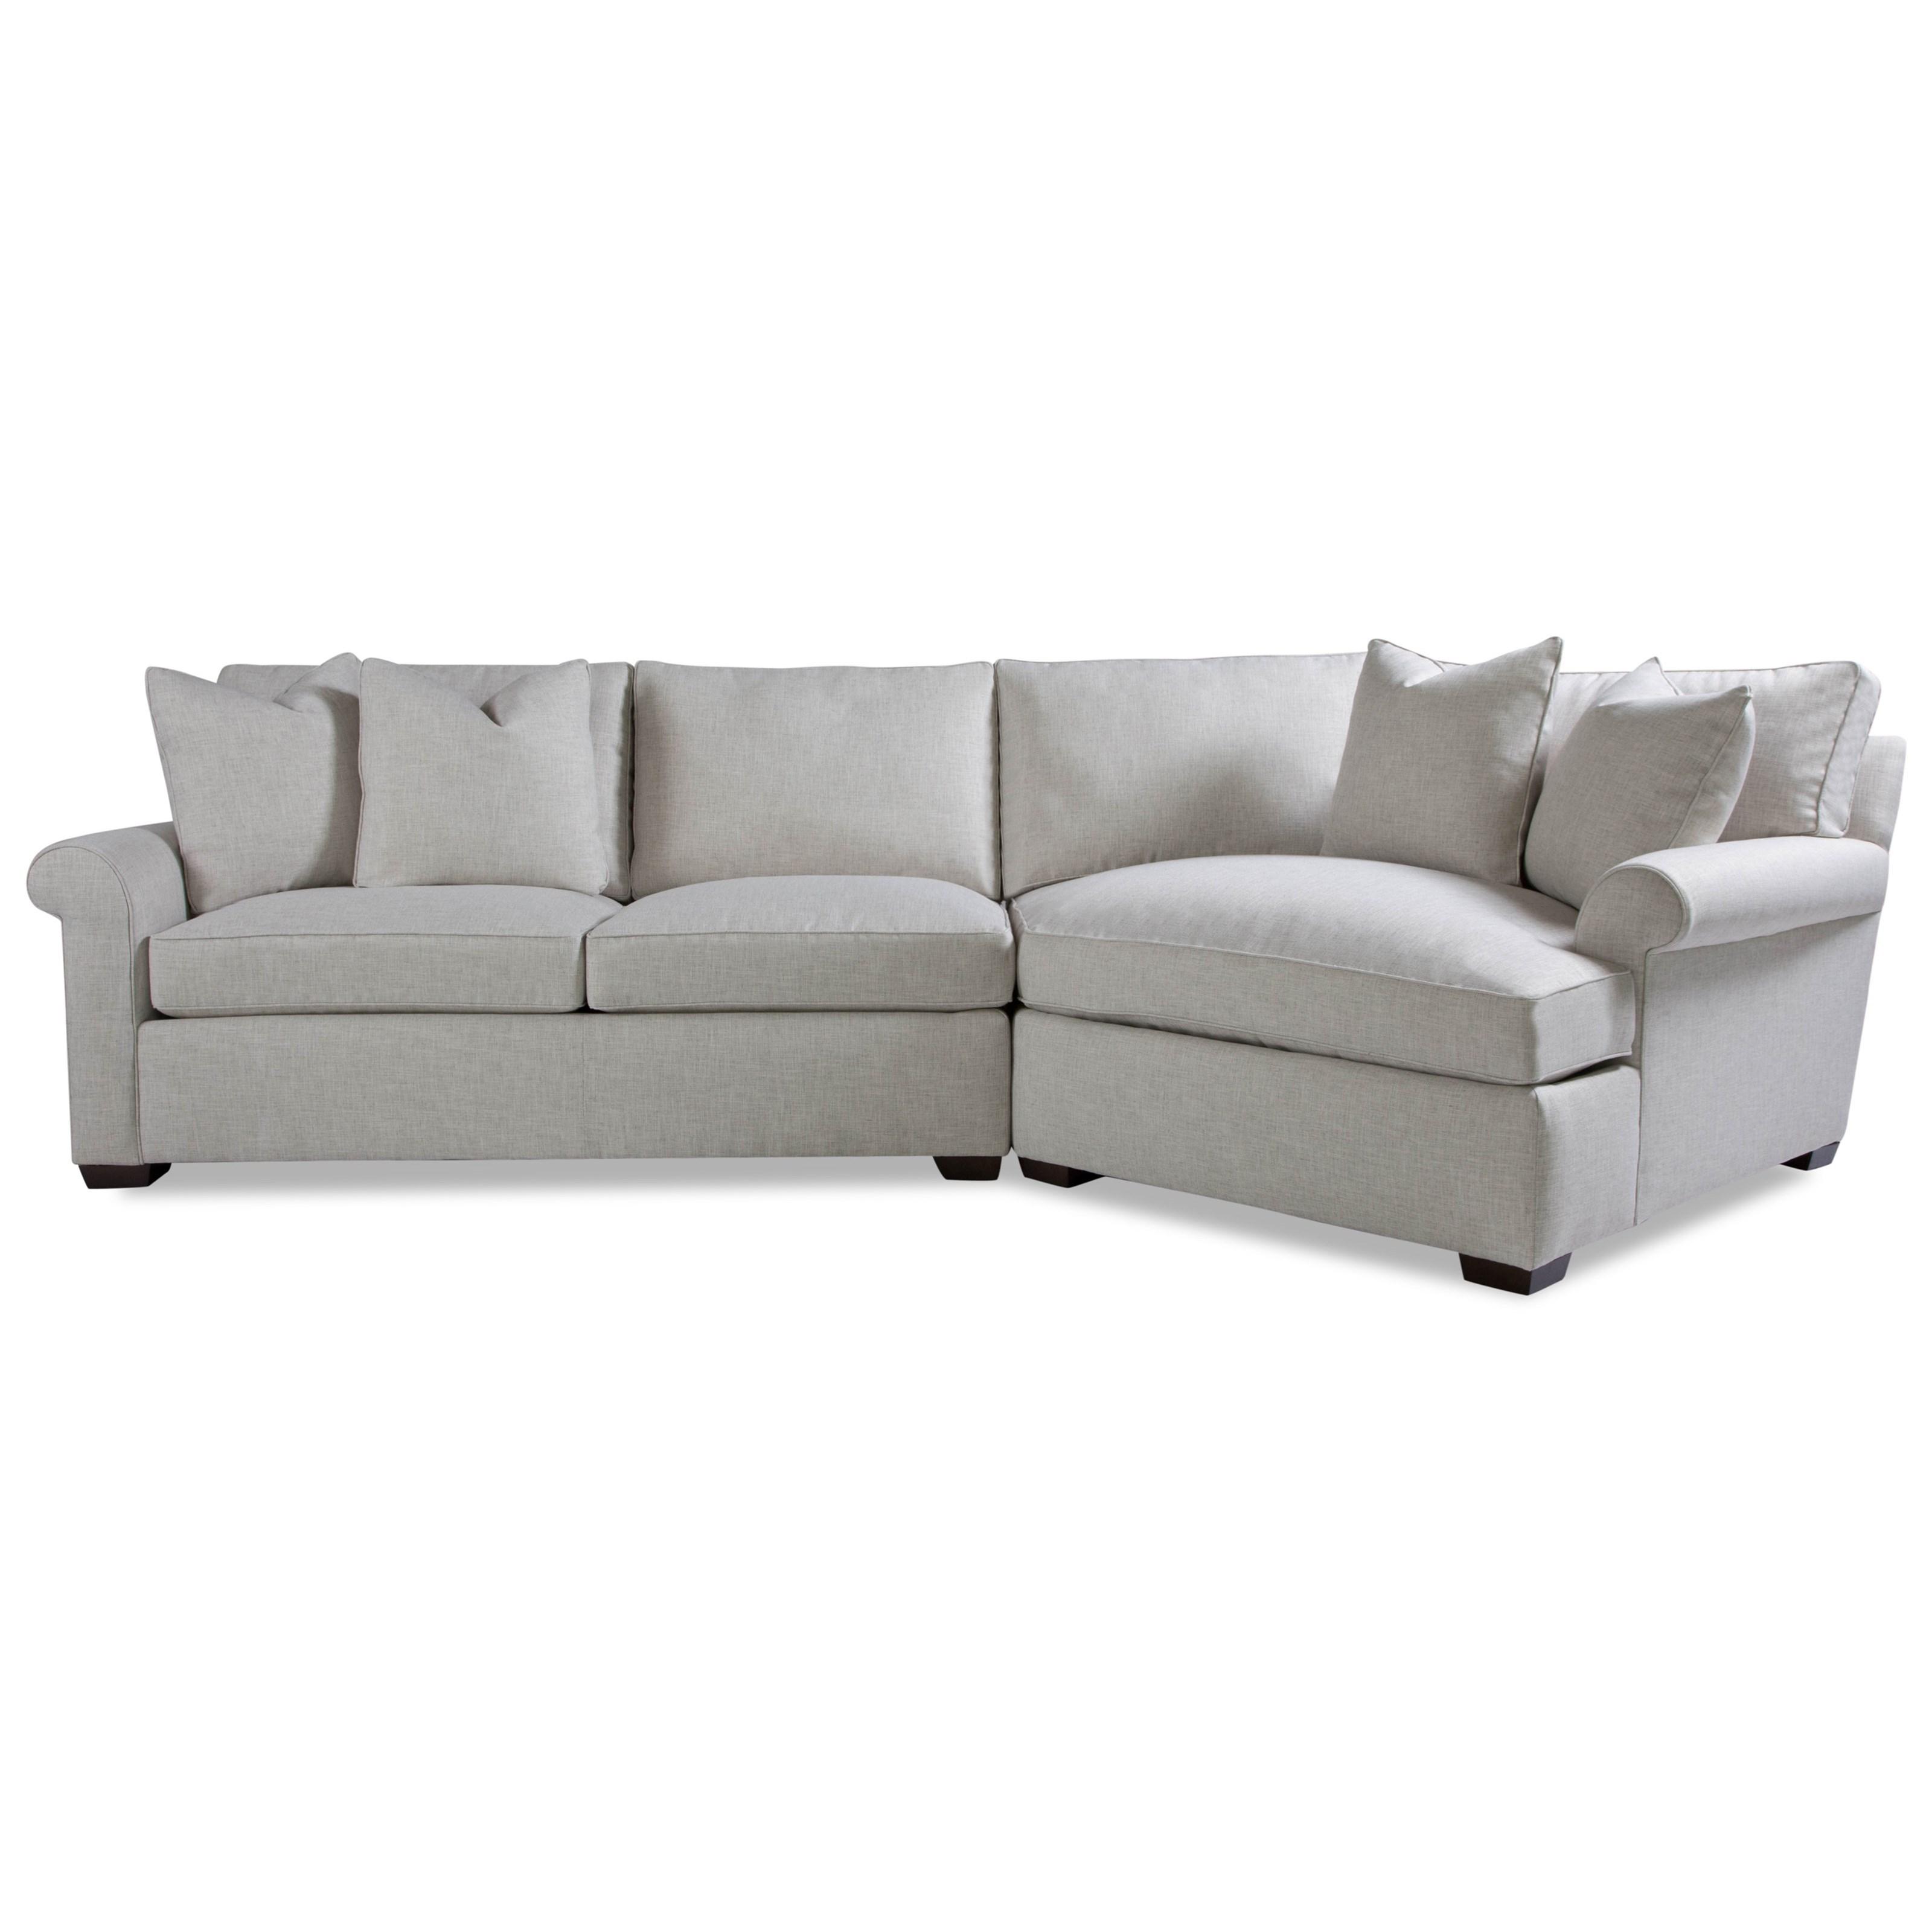 Plush 2 Pc Sectional Sofa w/ Roll Arm by Geoffrey Alexander at Sprintz Furniture